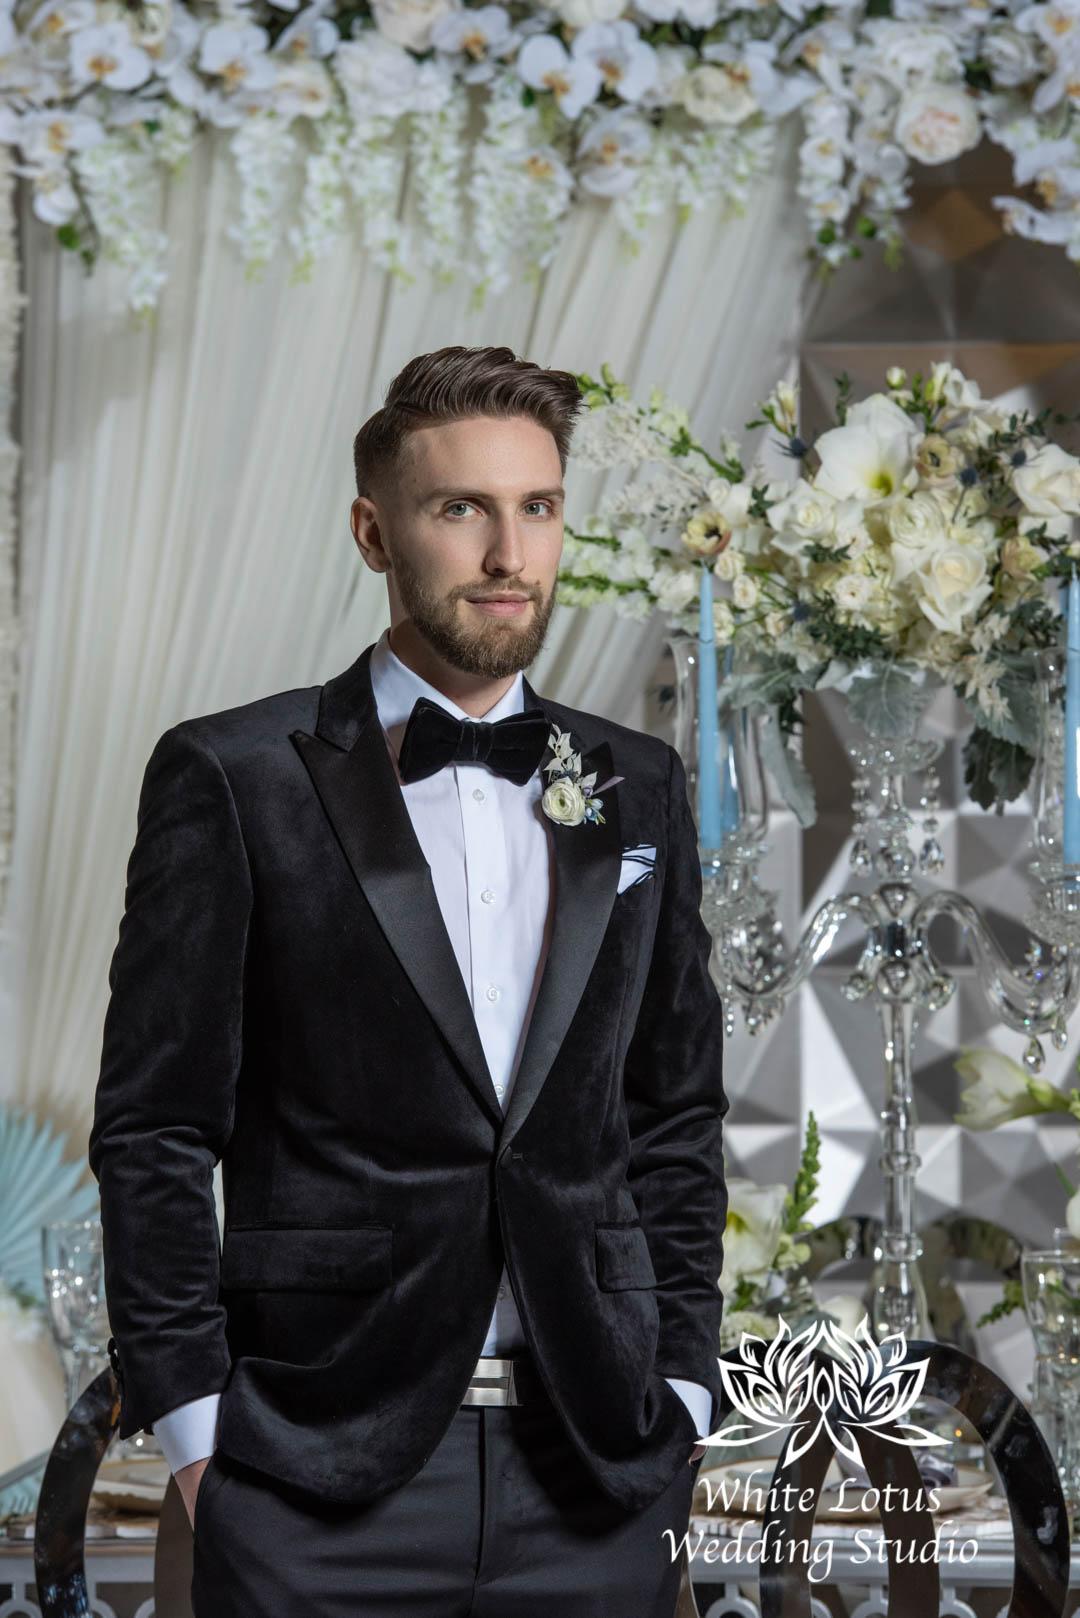 159- GLAM WINTERLUXE WEDDING INSPIRATION